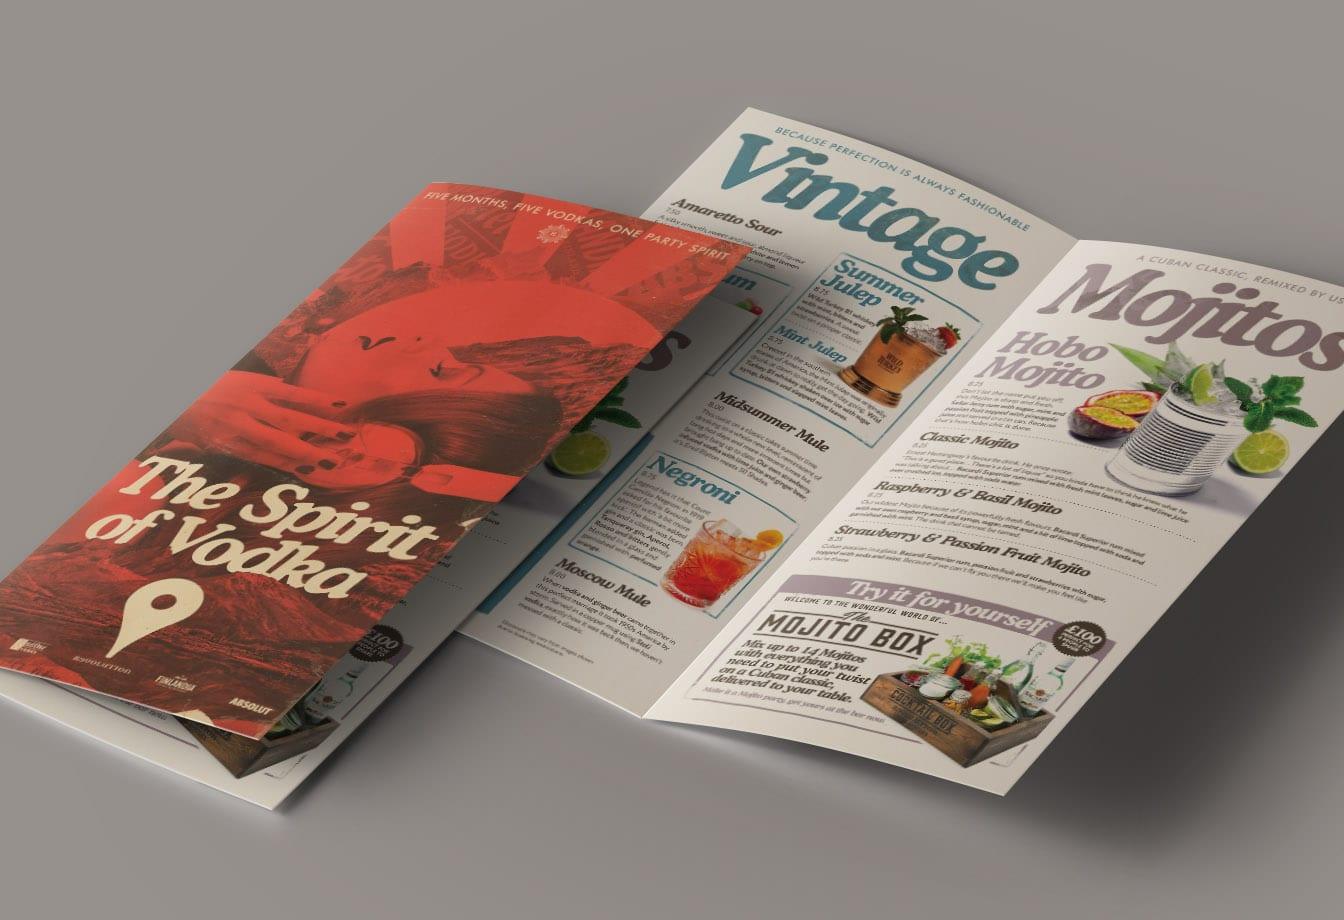 spirit of vodka menu covers